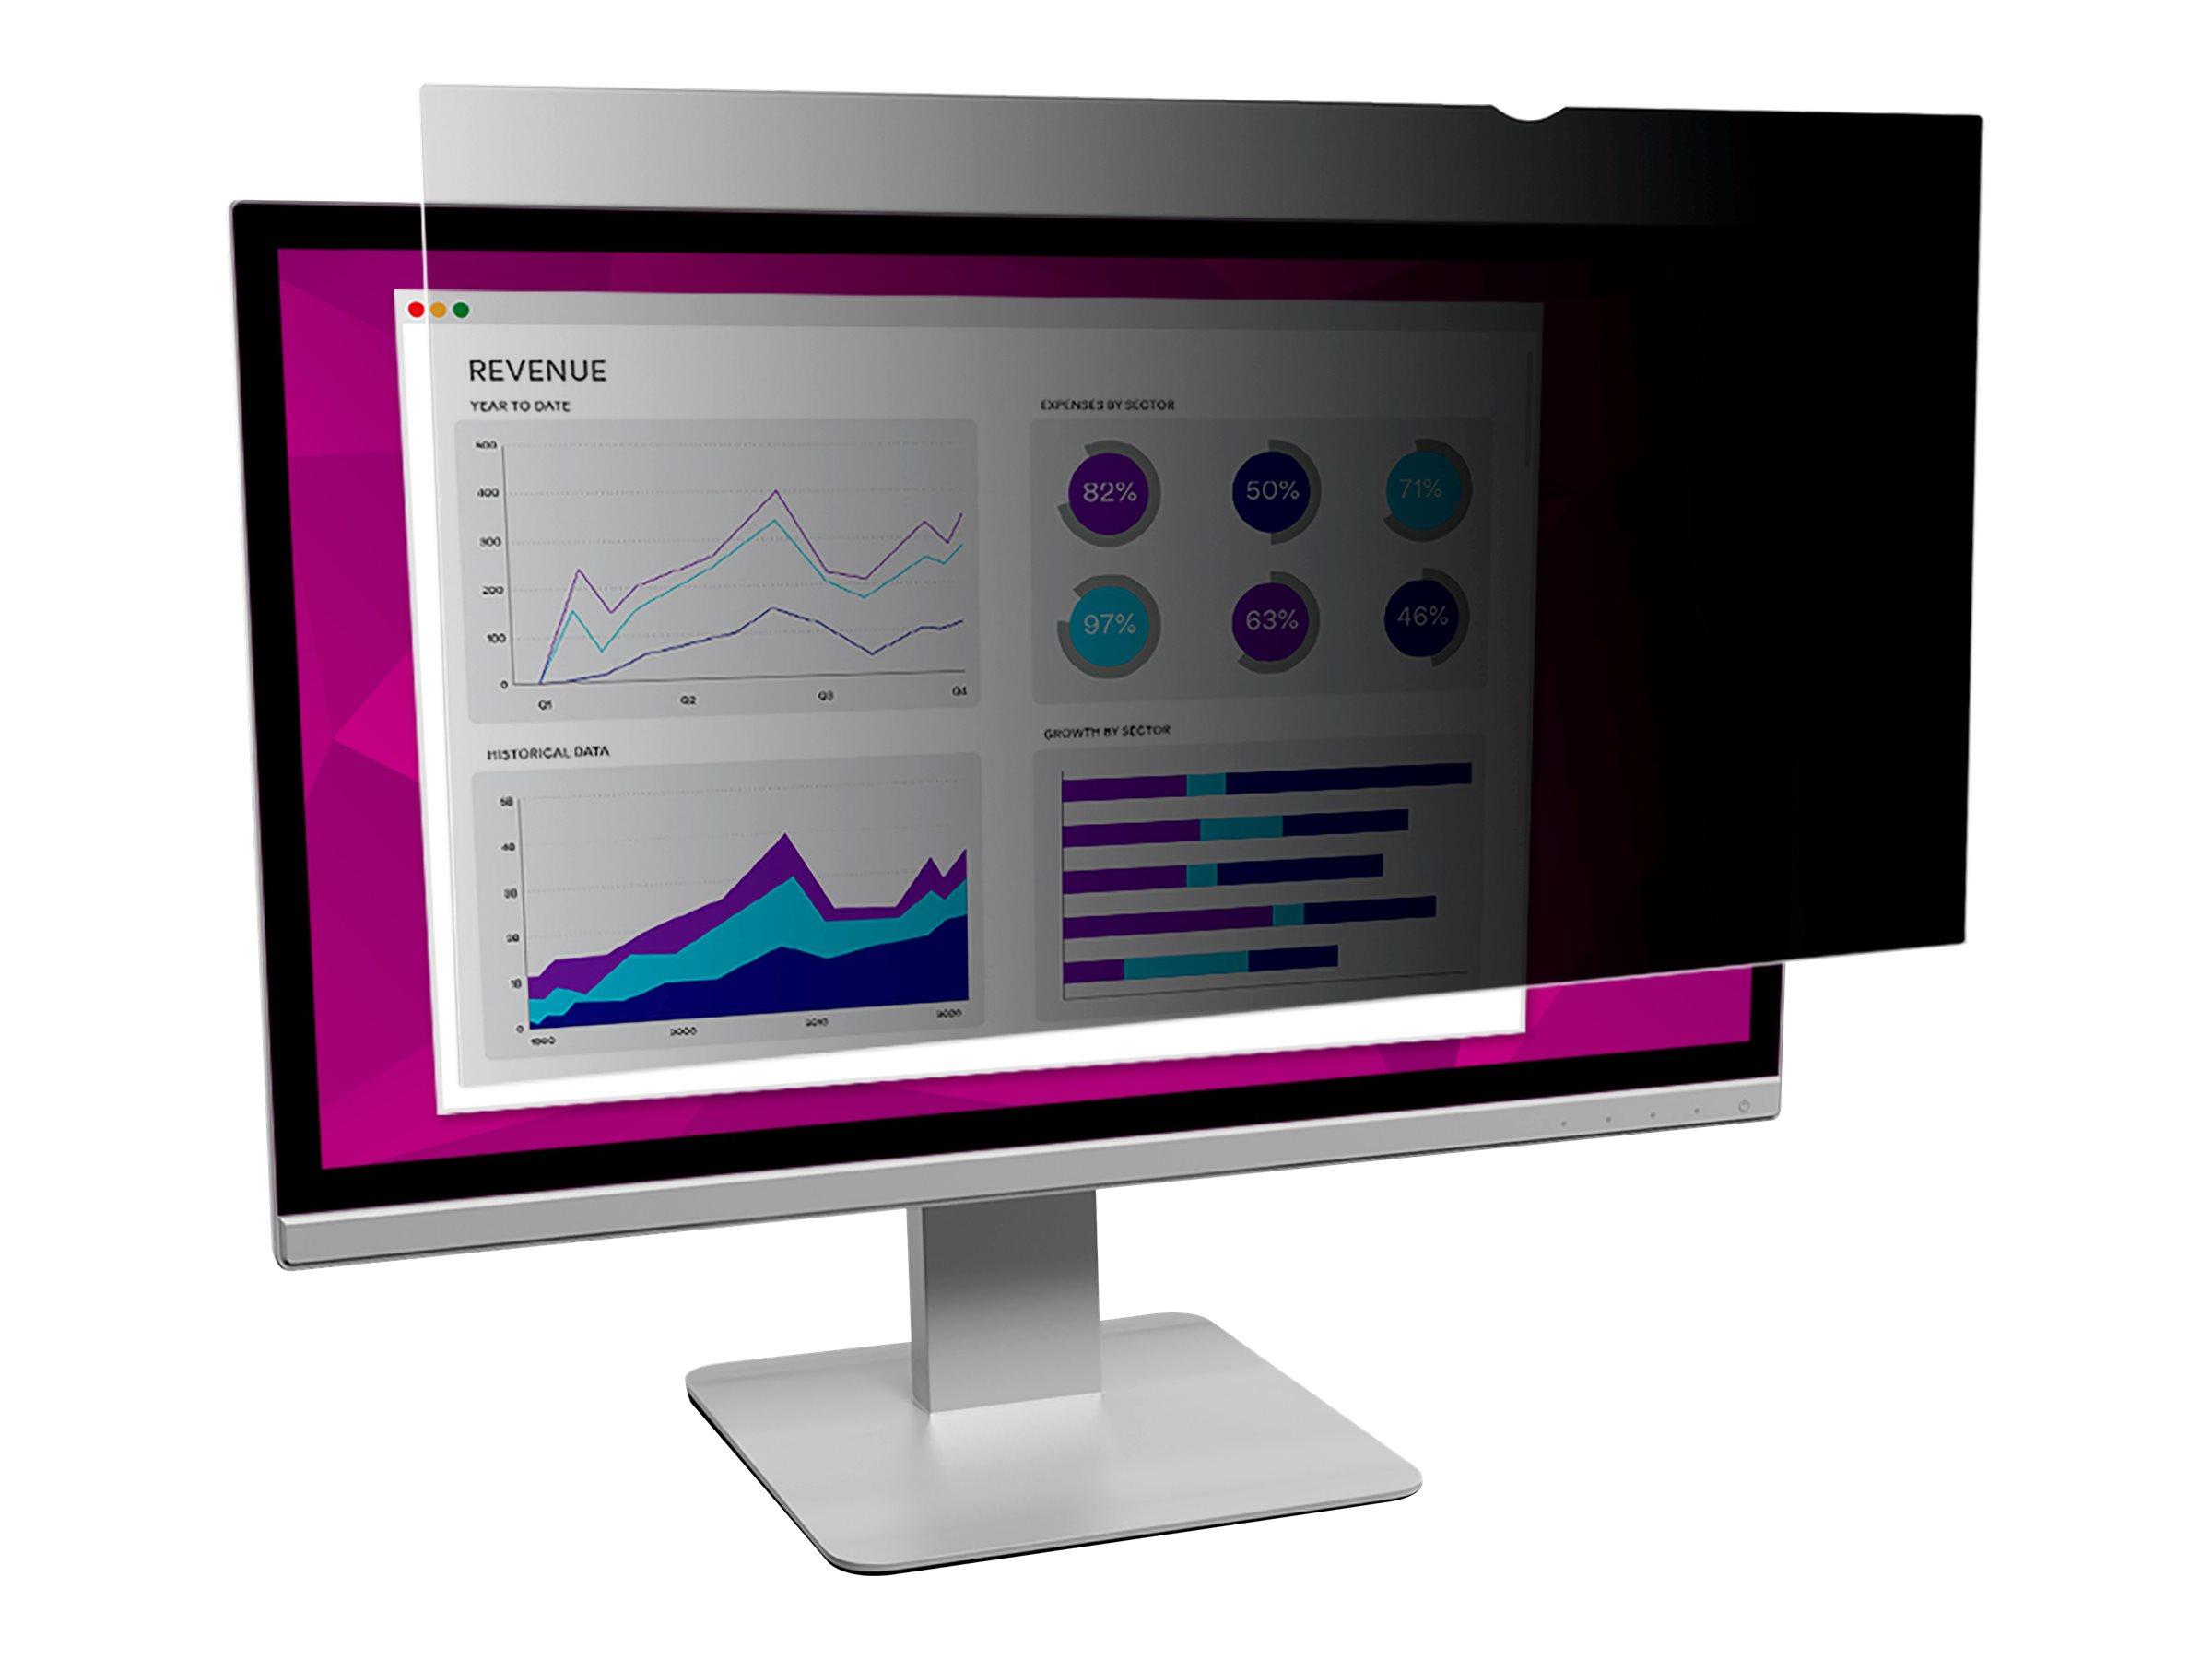 "3M Blickschutzfilter High Clarity für 23,8"" Breitbild-Monitor - Blickschutzfilter für Bildschirme - 60.5 cm wide (23,8 Zoll Breitbild)"